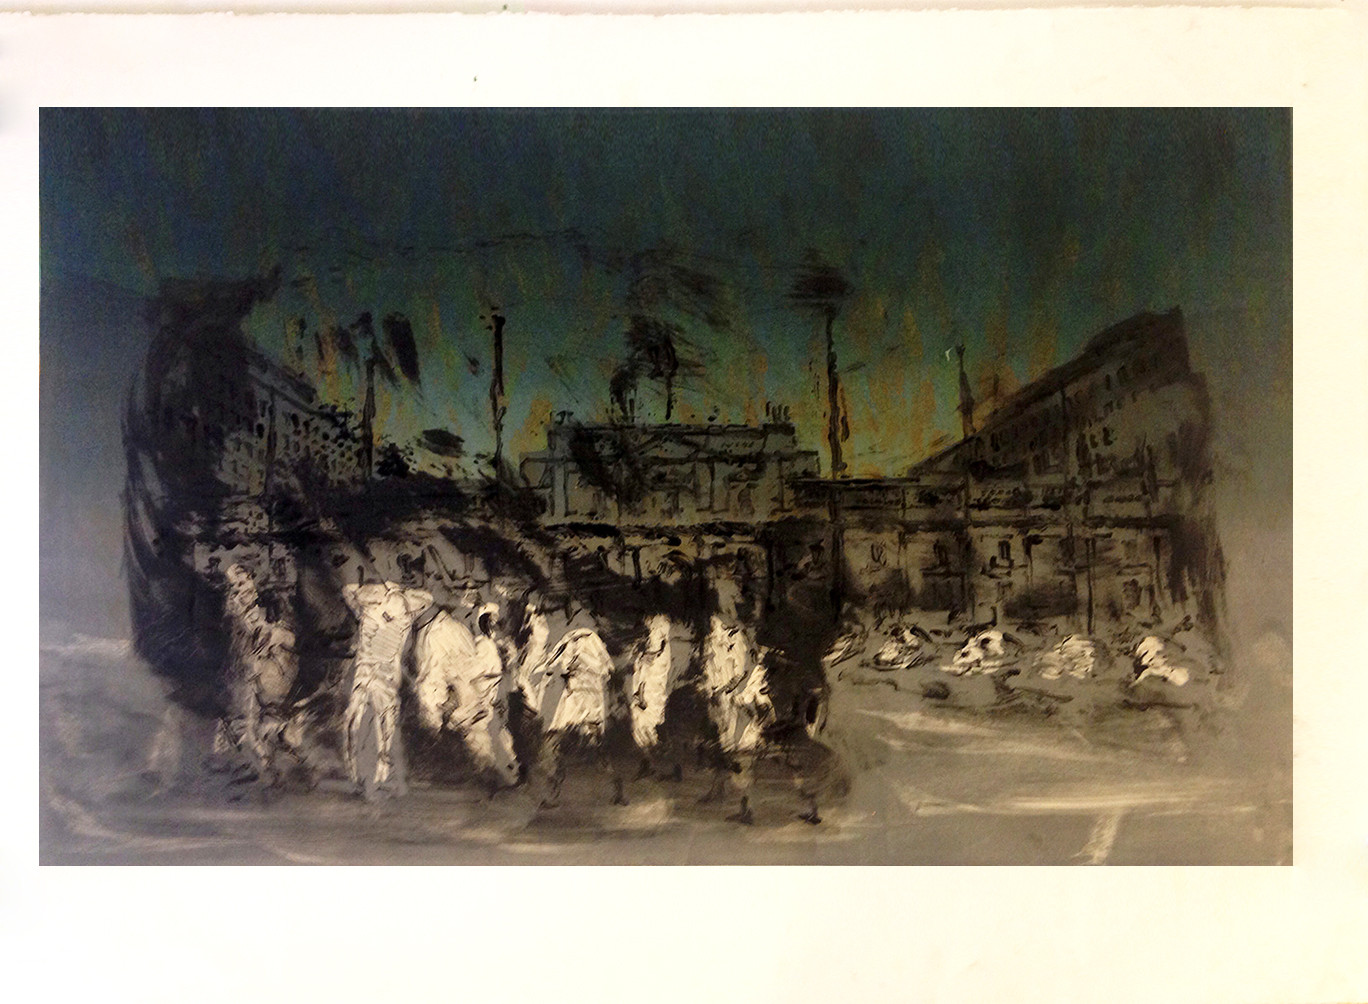 Coup d'etat, 11.11.1973, etching, 44 x 32 in, 2015.jpg